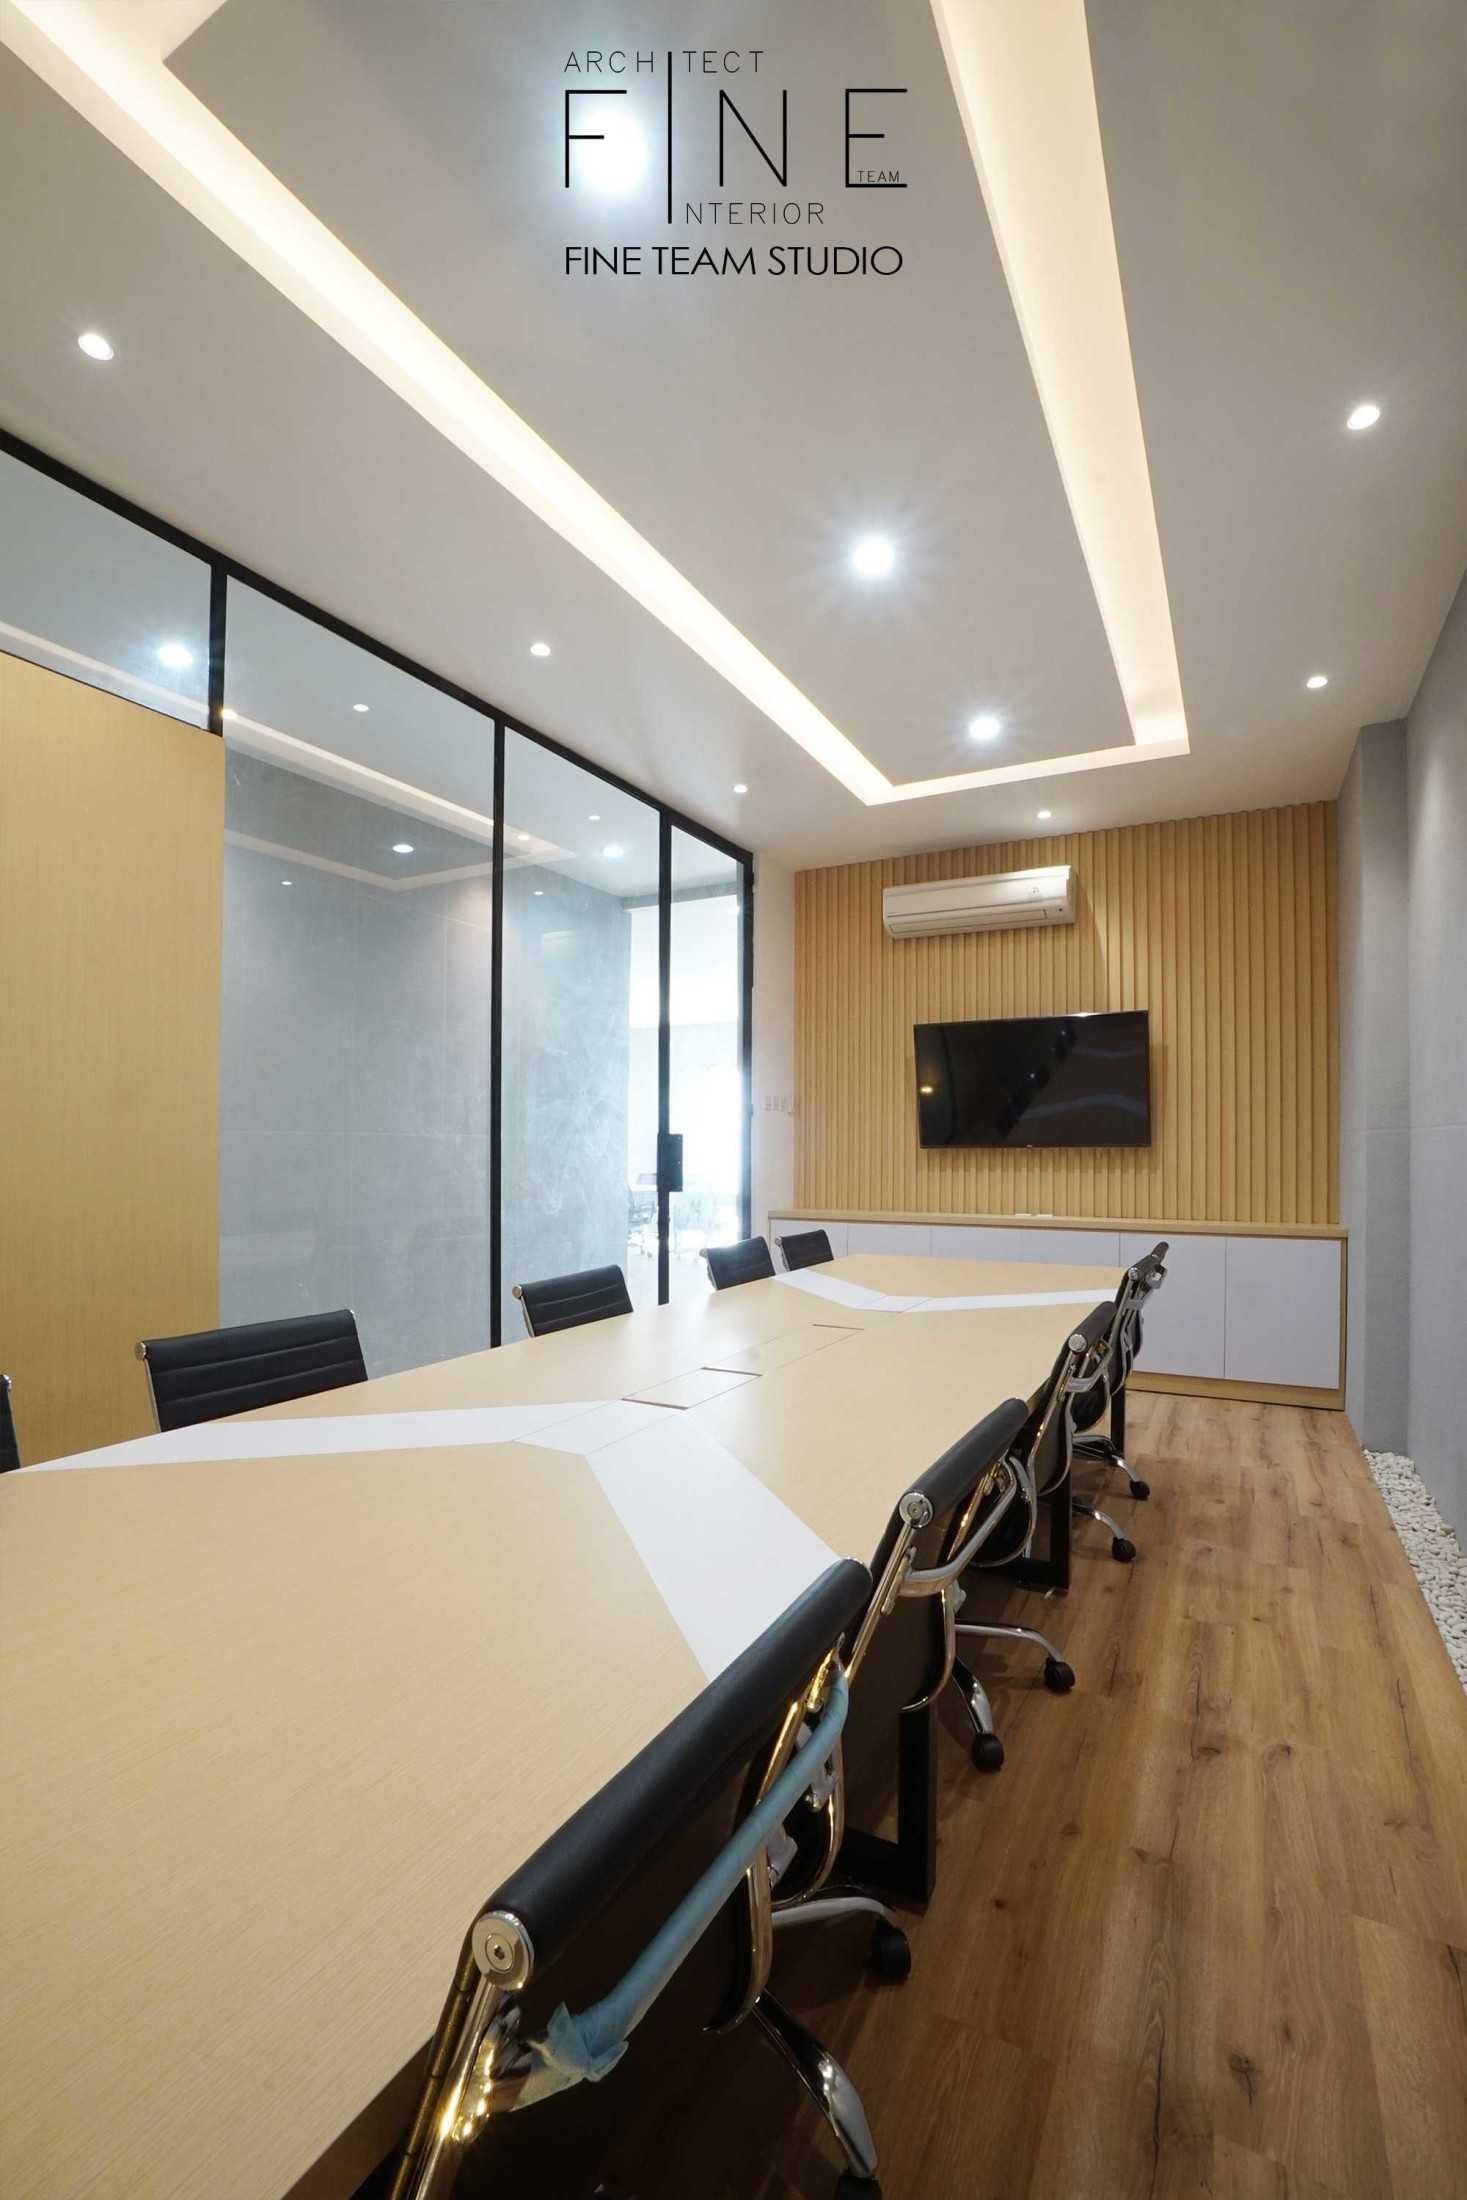 Fine Team Studio Mob Office Cikupa, Tangerang, Banten, Indonesia Cikupa, Tangerang, Banten, Indonesia Fine-Team-Studio-Mob-Office  71145